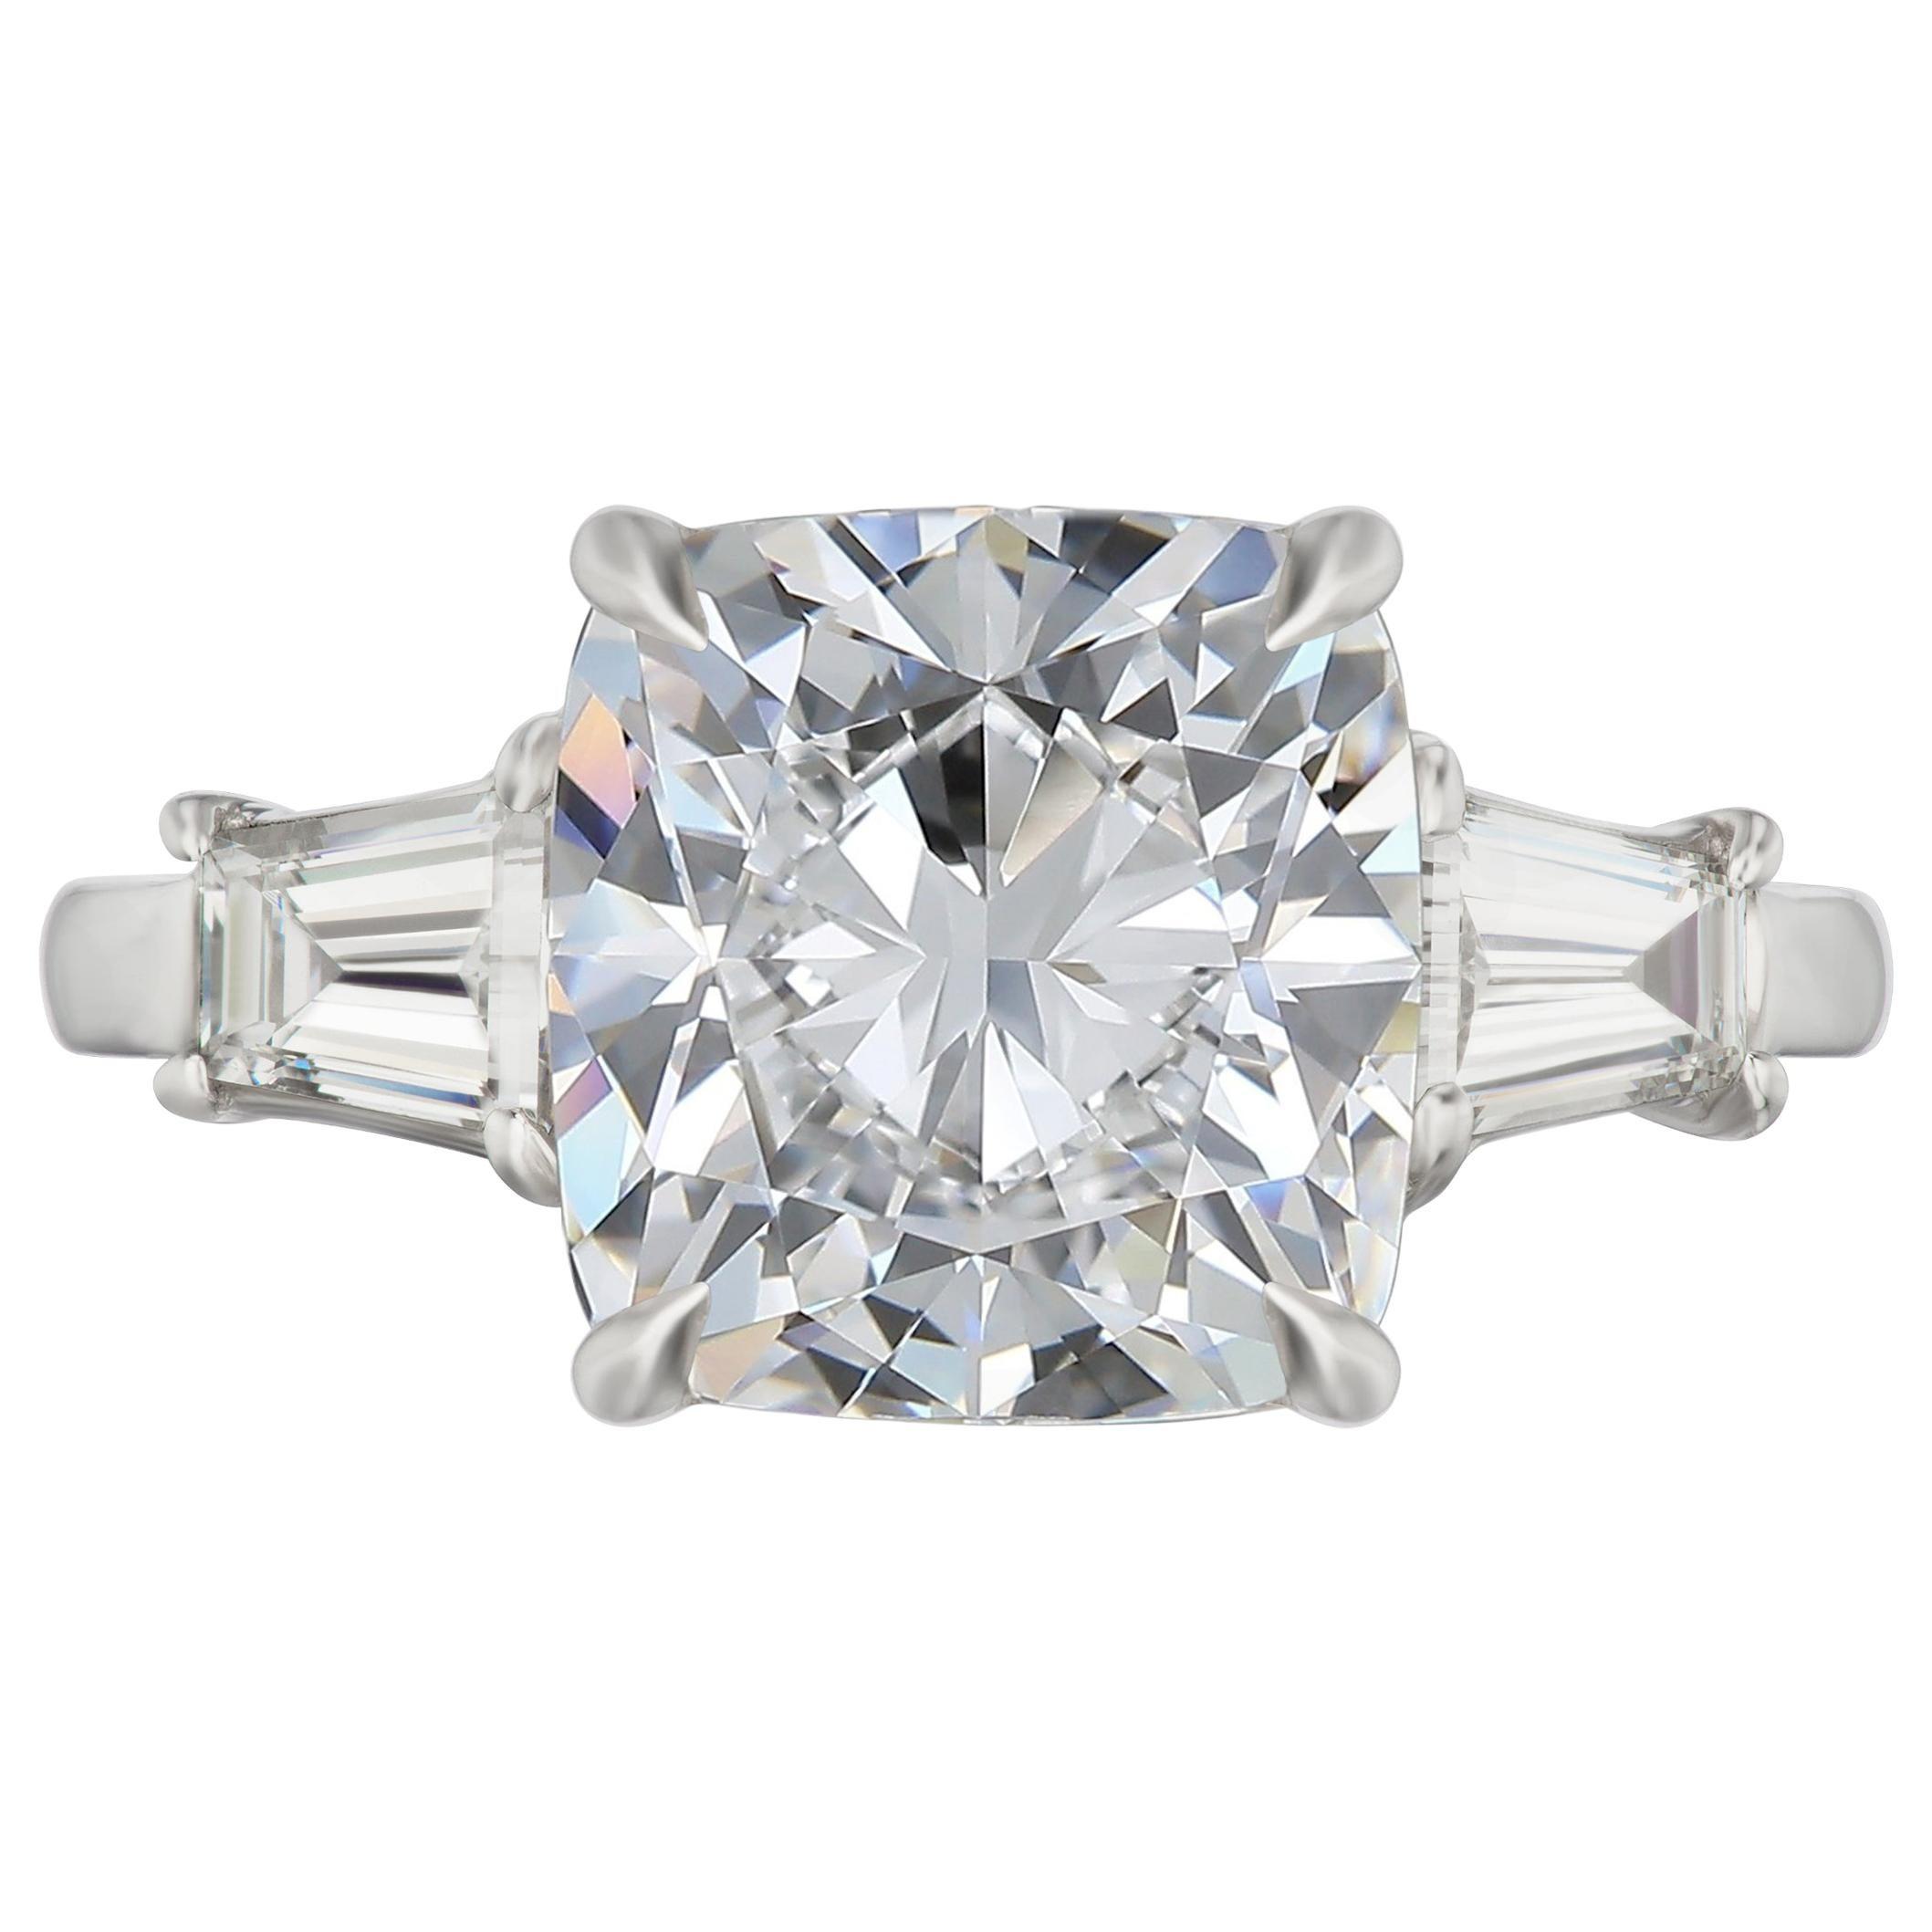 FLAWLESS GIA Certified 4 Carat Cushion Modified Brilliant Cut Diamond Ring